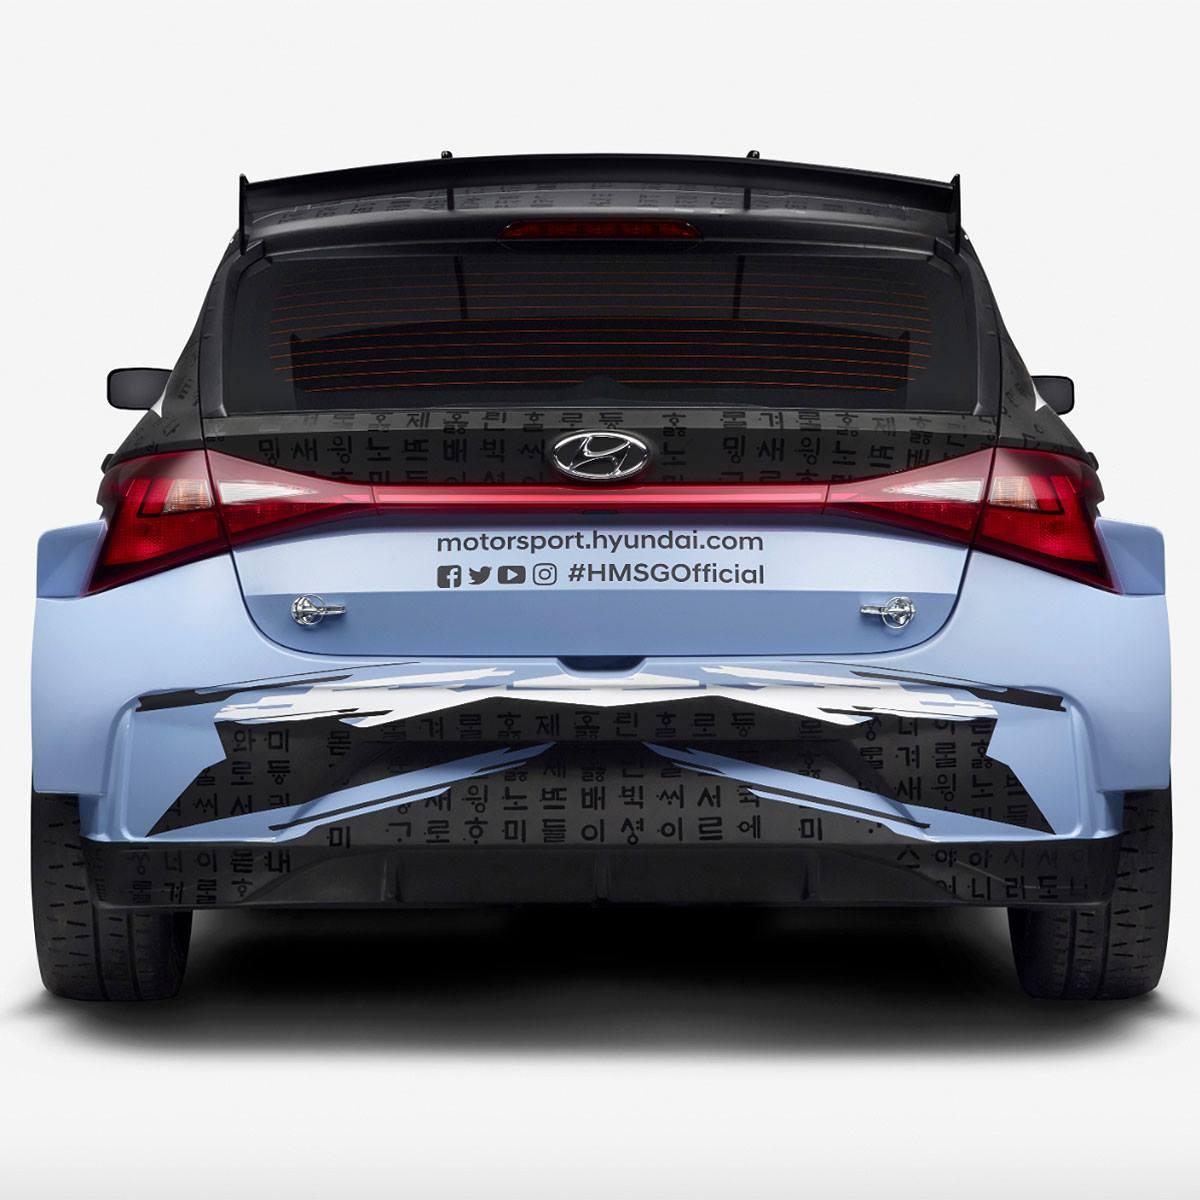 Hyundai-i20-N-rally-4